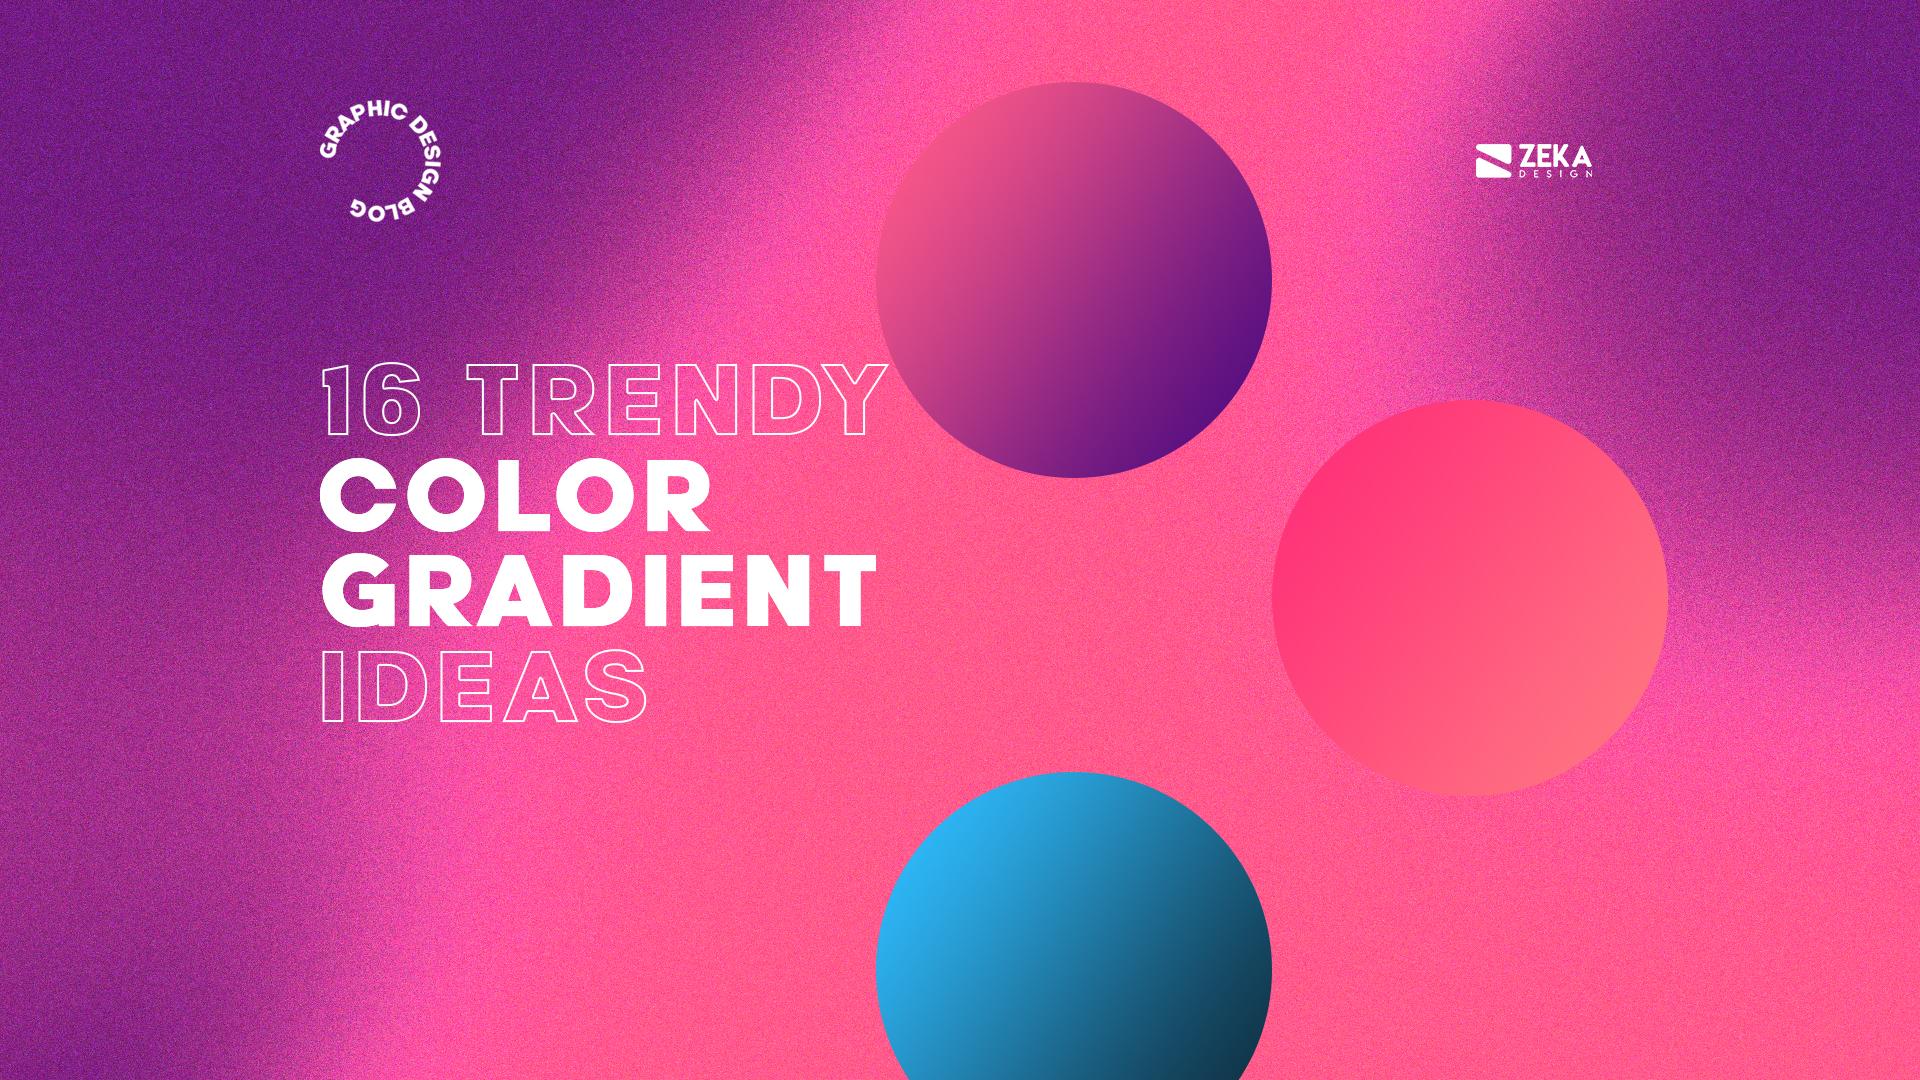 16 Trendy Color Gradient Ideas in 2021 for Graphic Design